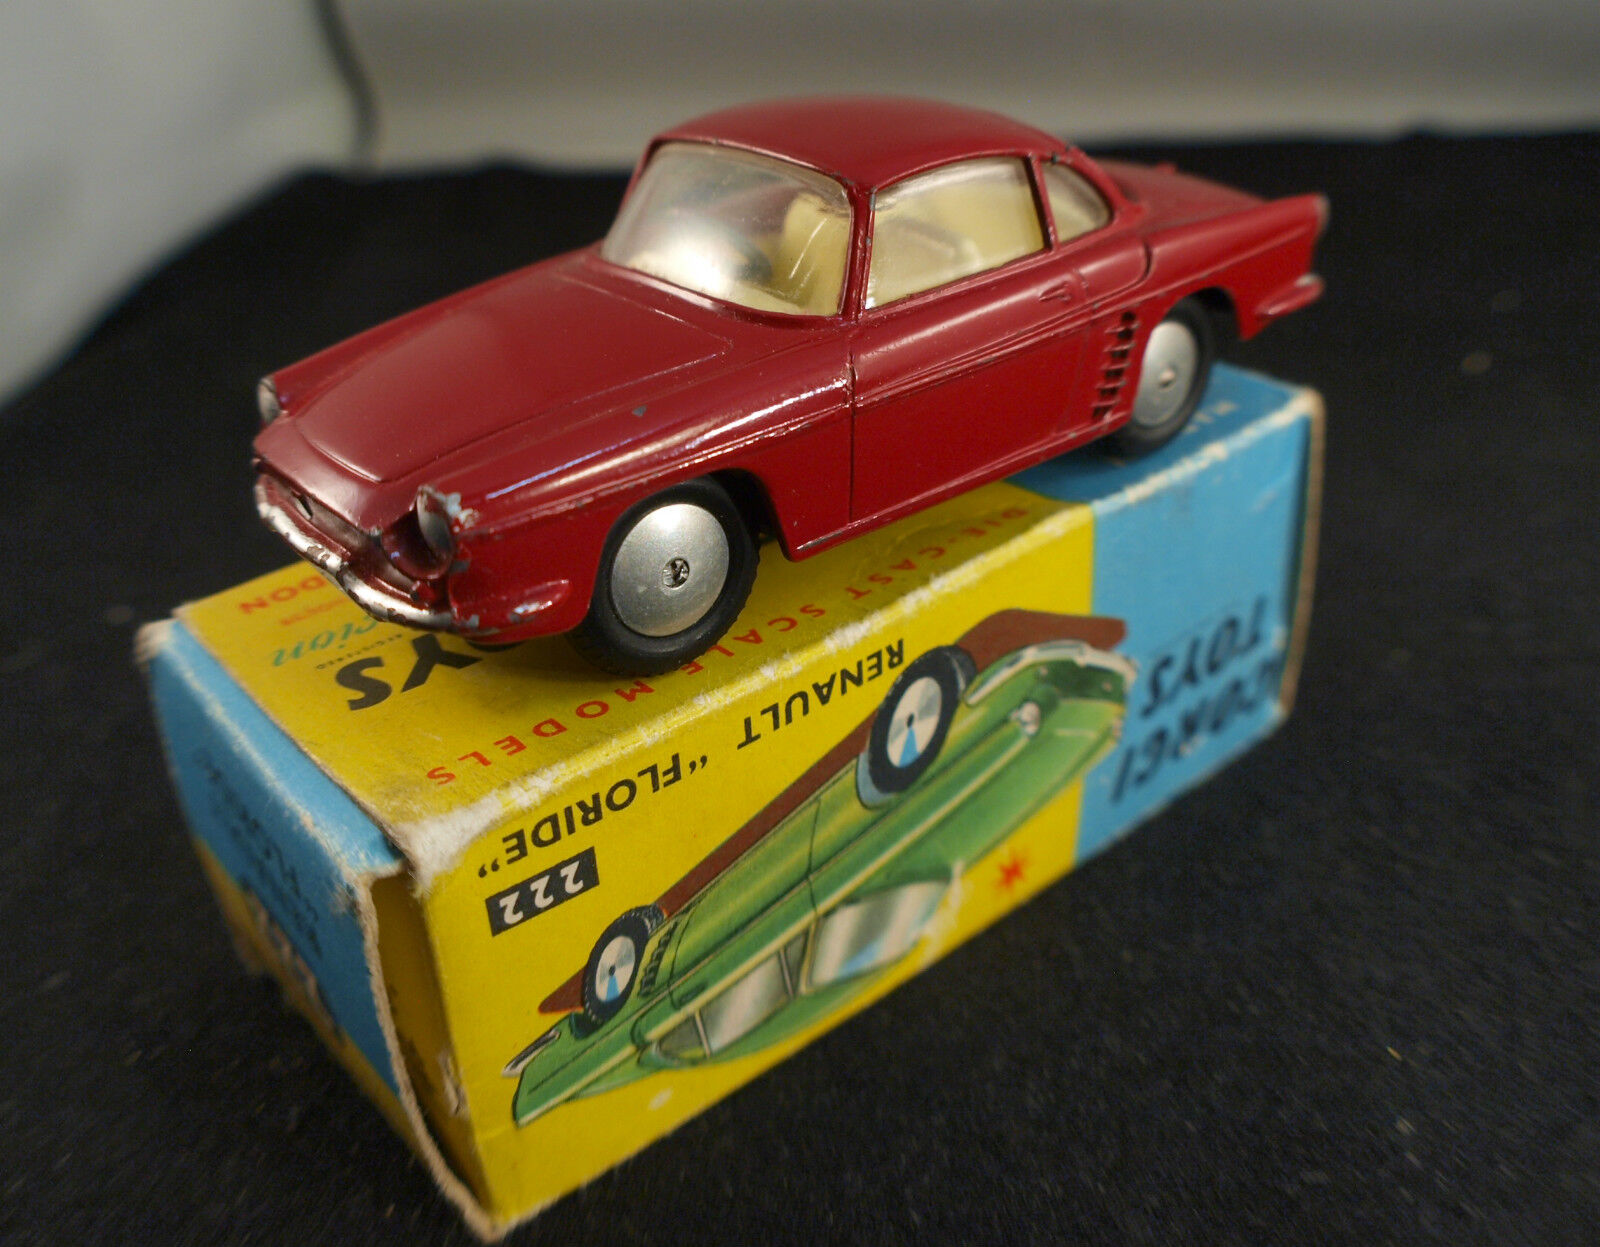 Corgi GB 222 Renault Floride rarement joué en boite 1964  RARE